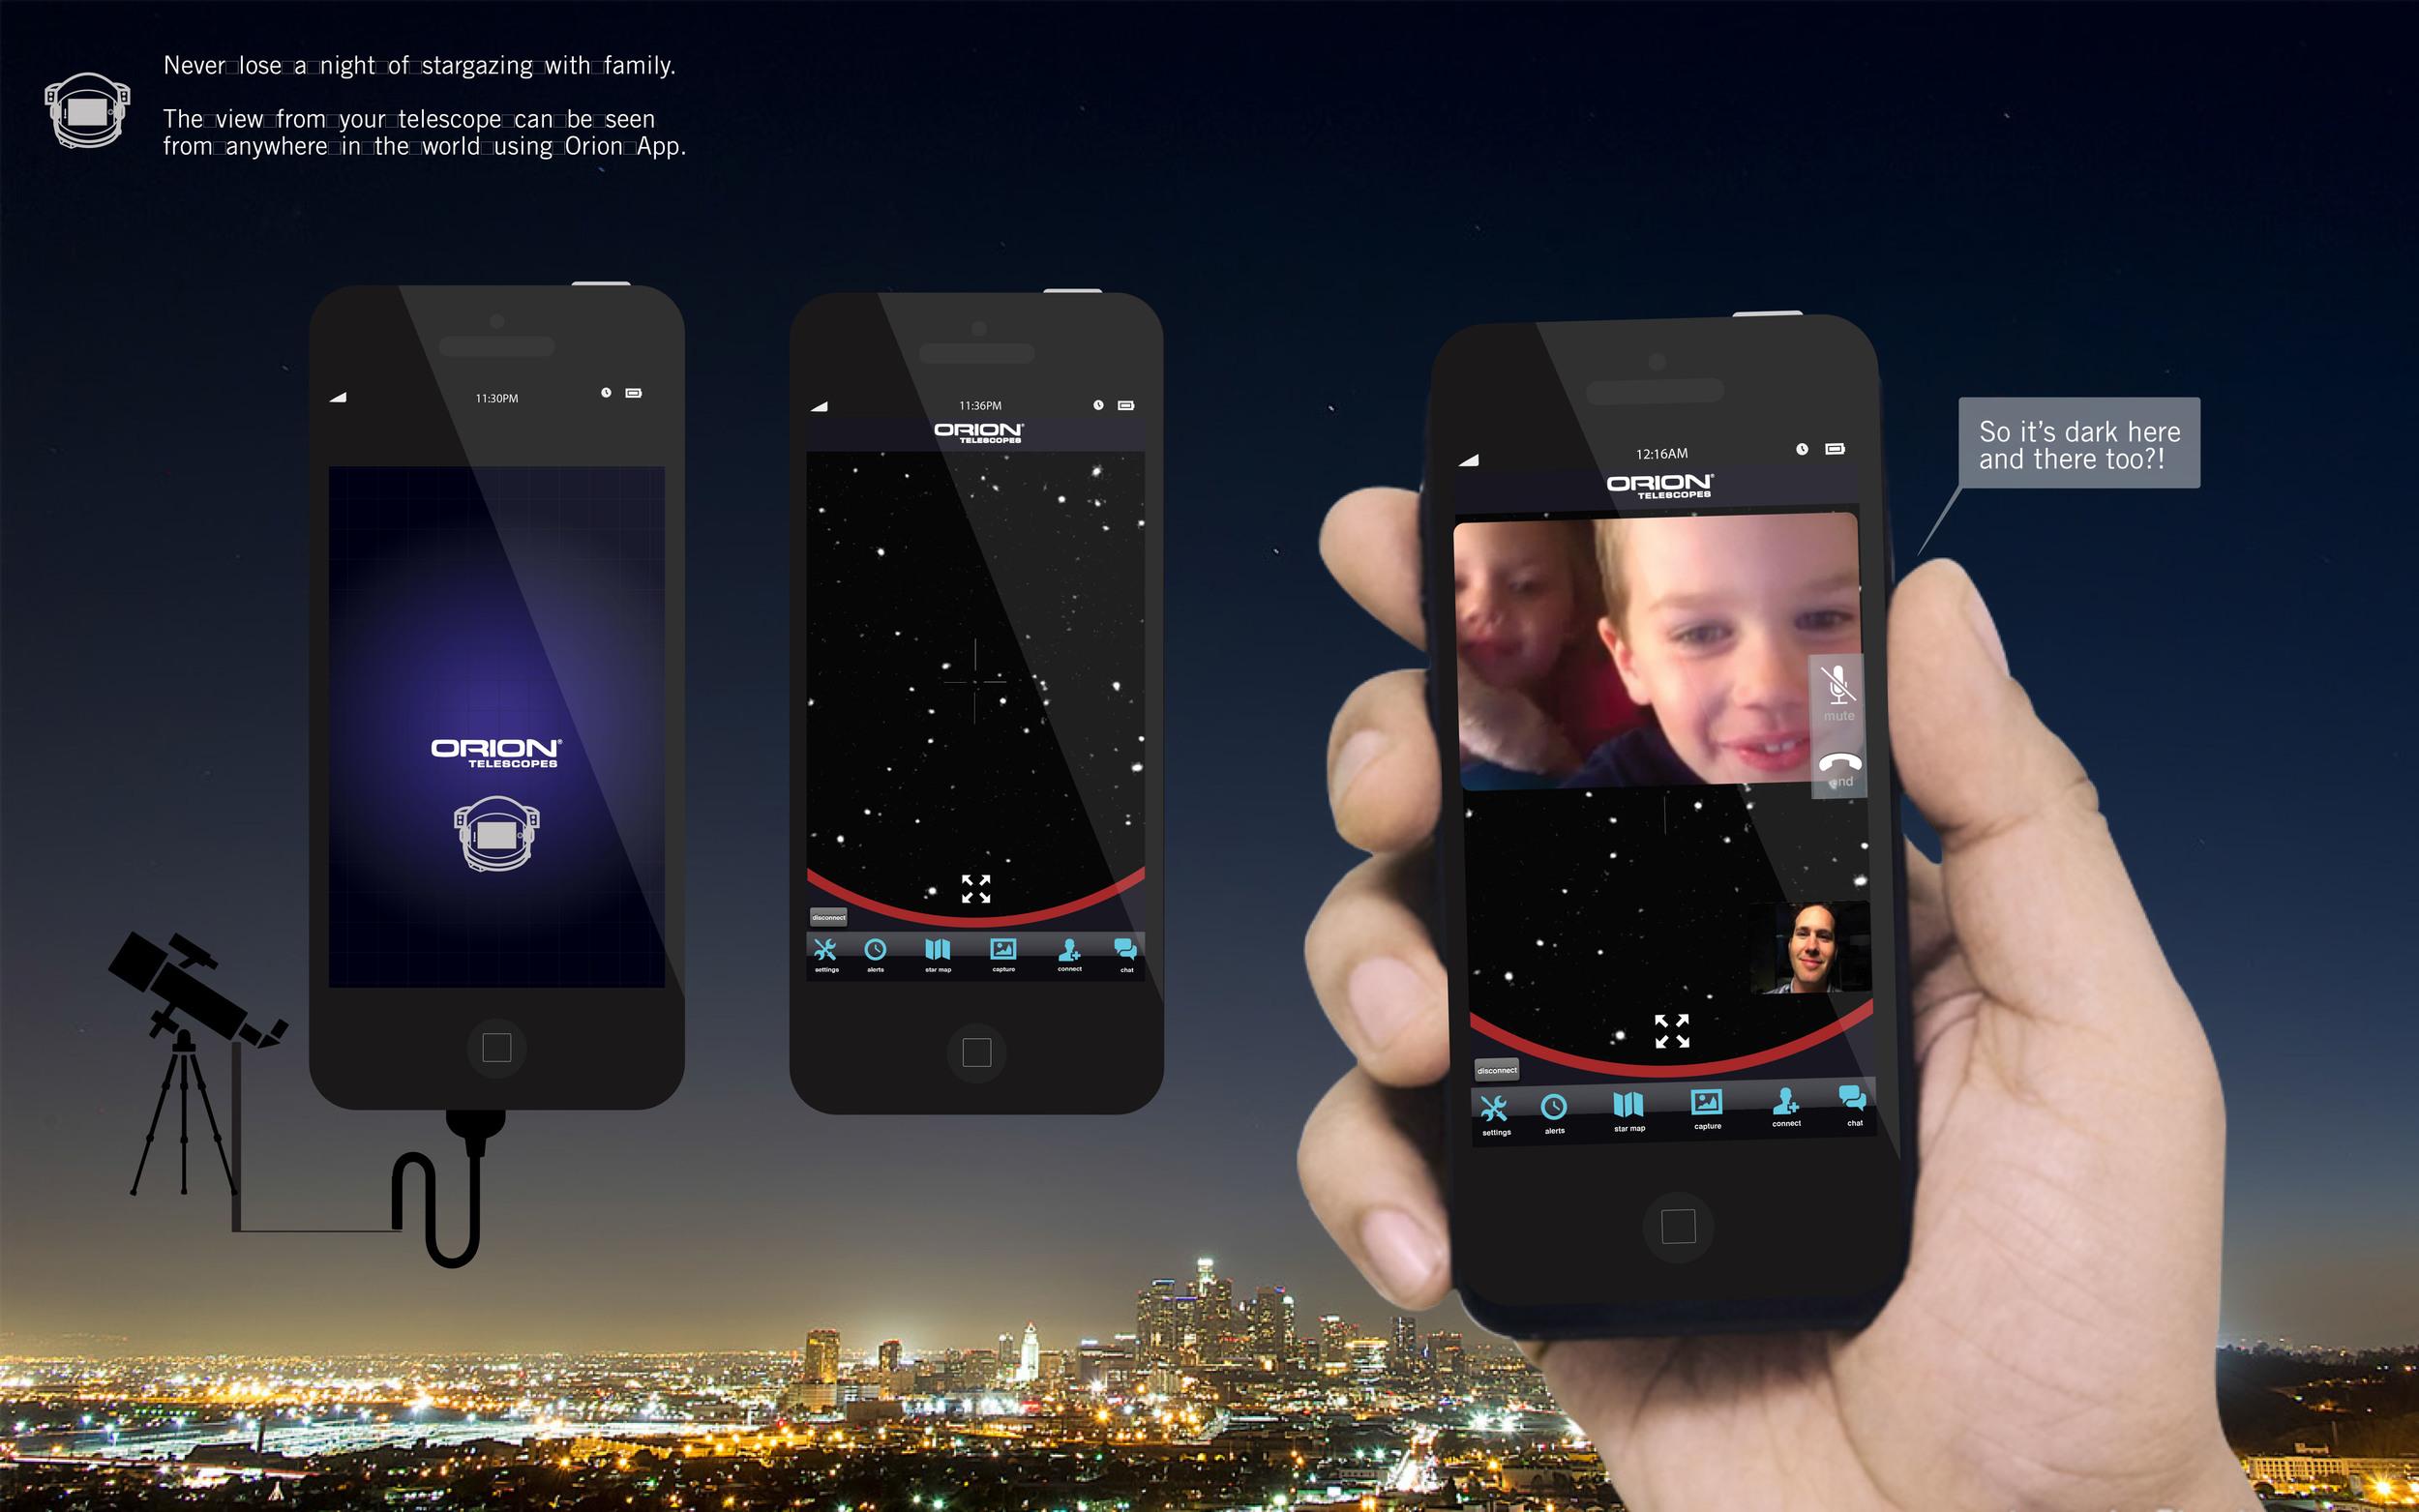 Orion_App+Screens+(layout).jpg